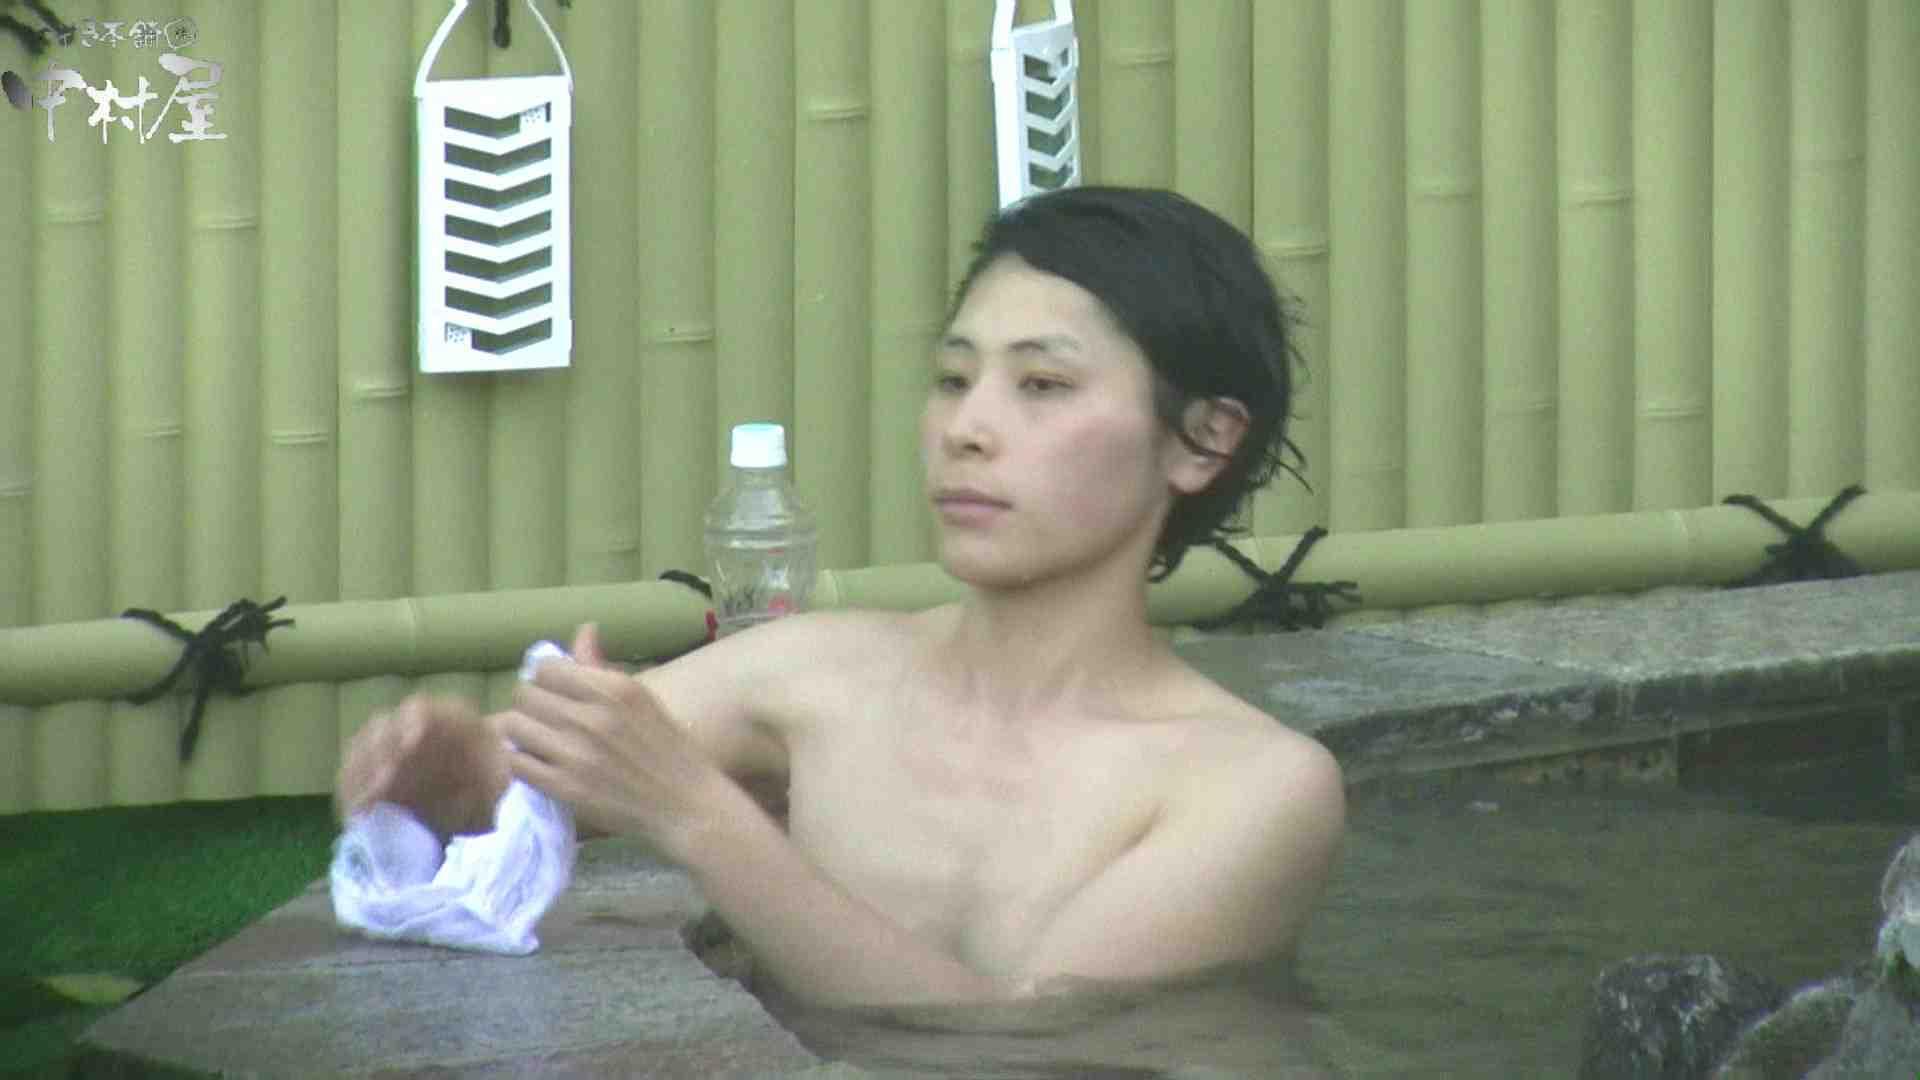 Aquaな露天風呂Vol.970 OL  59連発 34